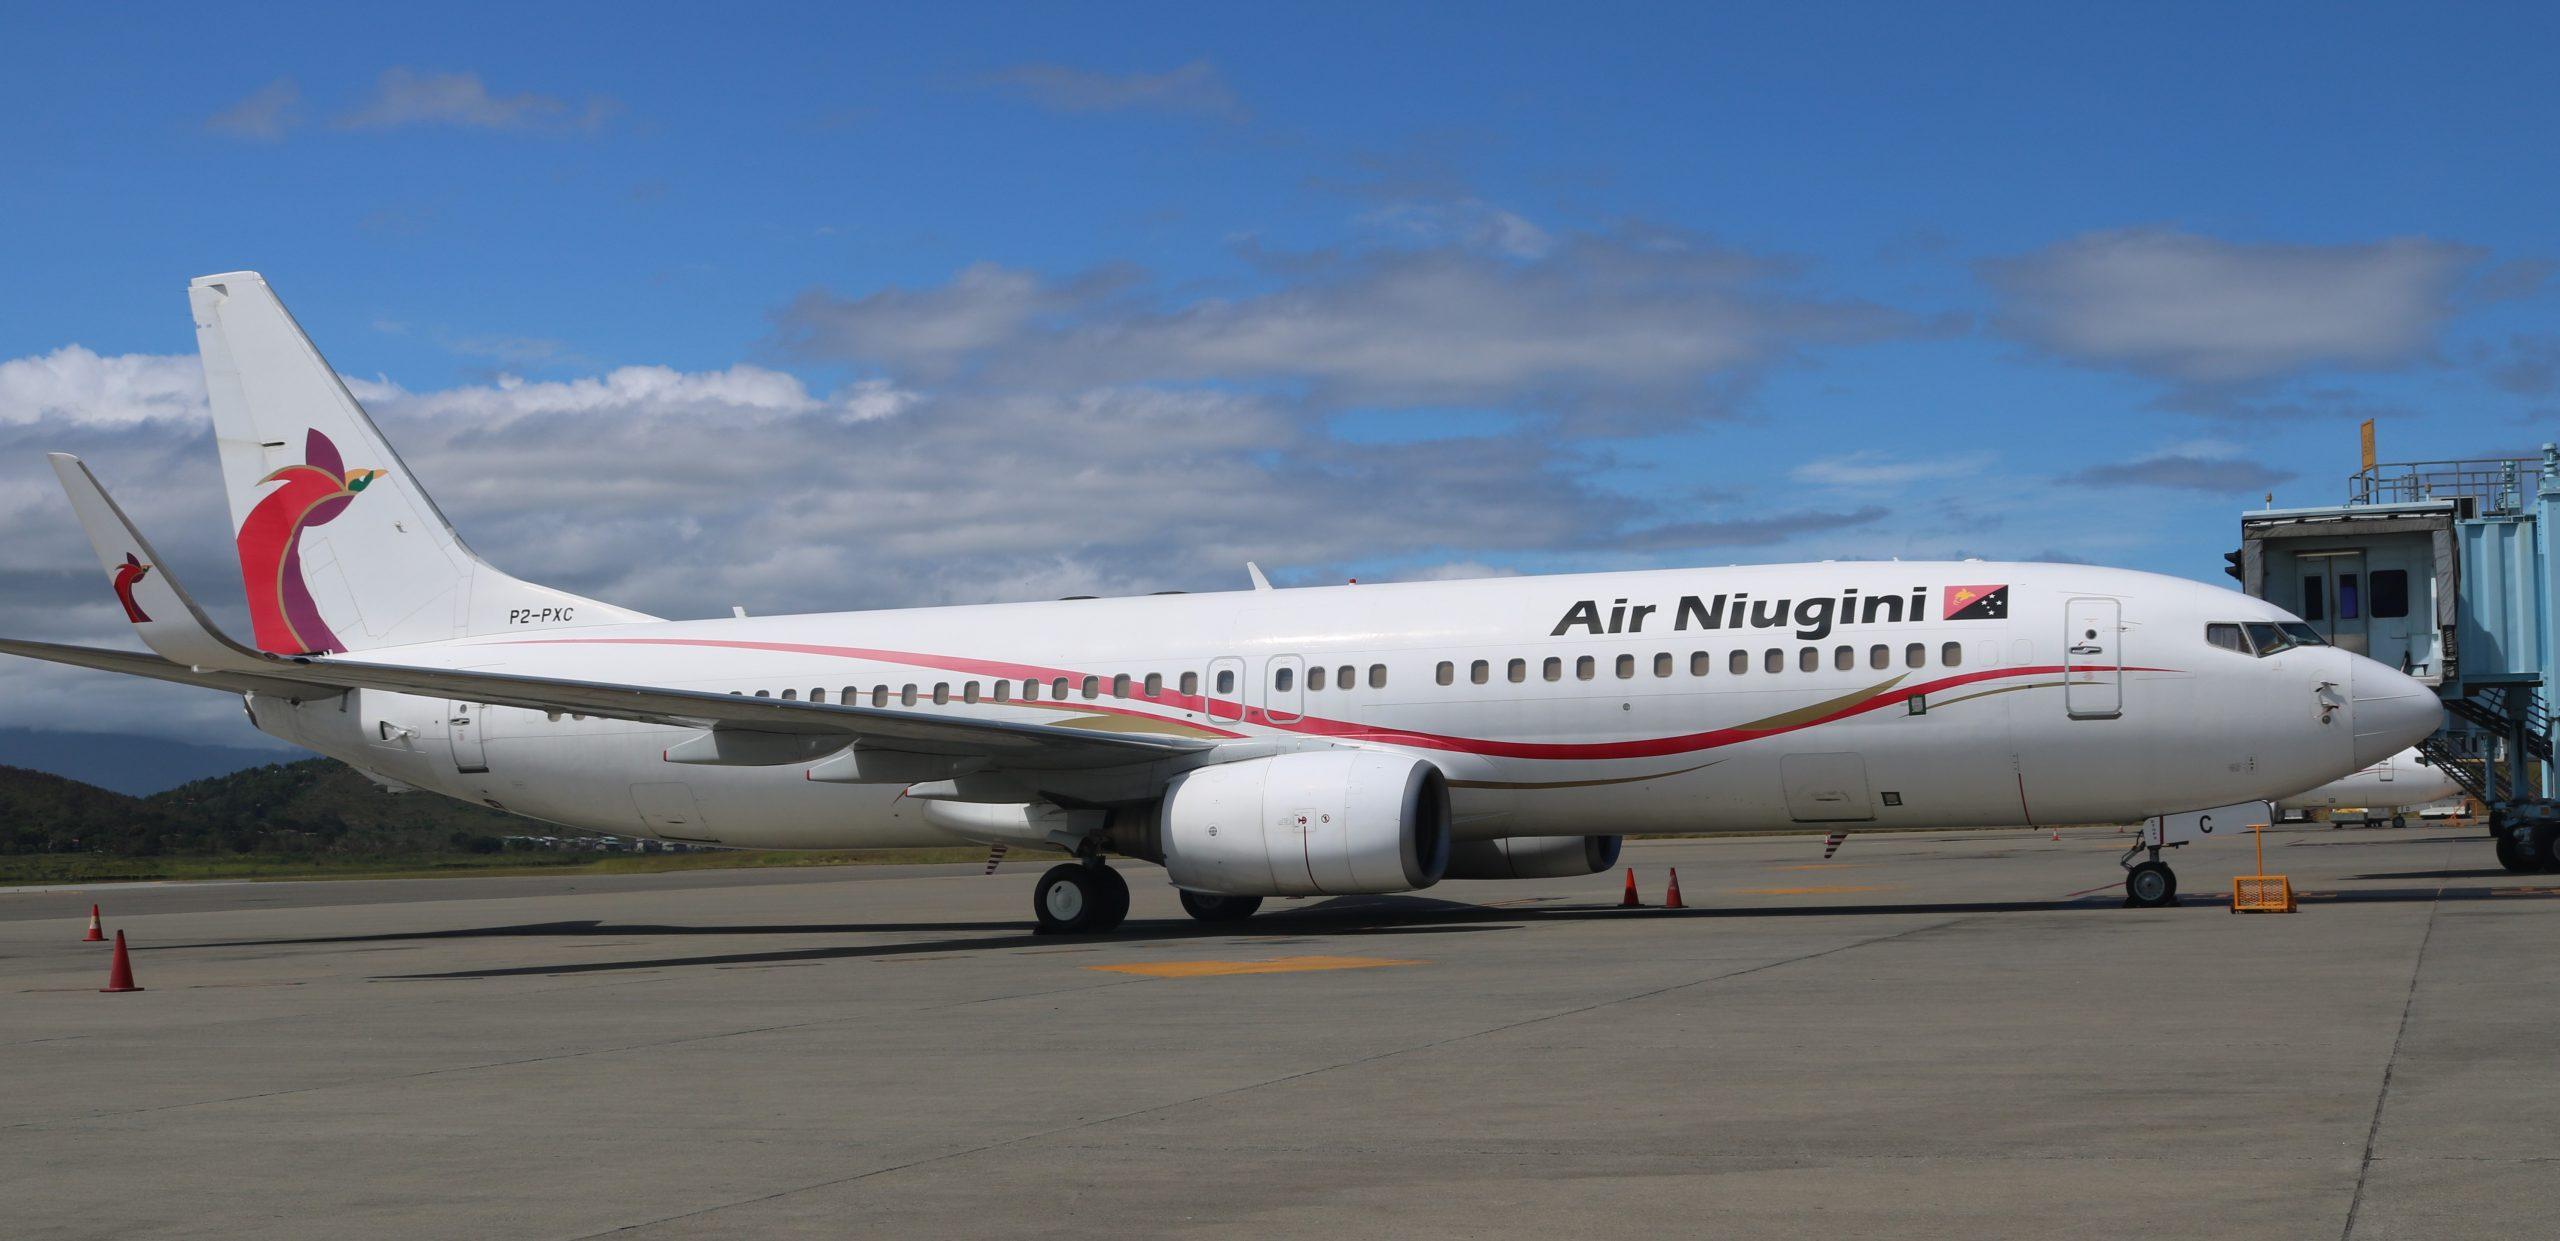 Air Niugini Upgrades Gurney Flights To Larger Boeing 737 Aircraft